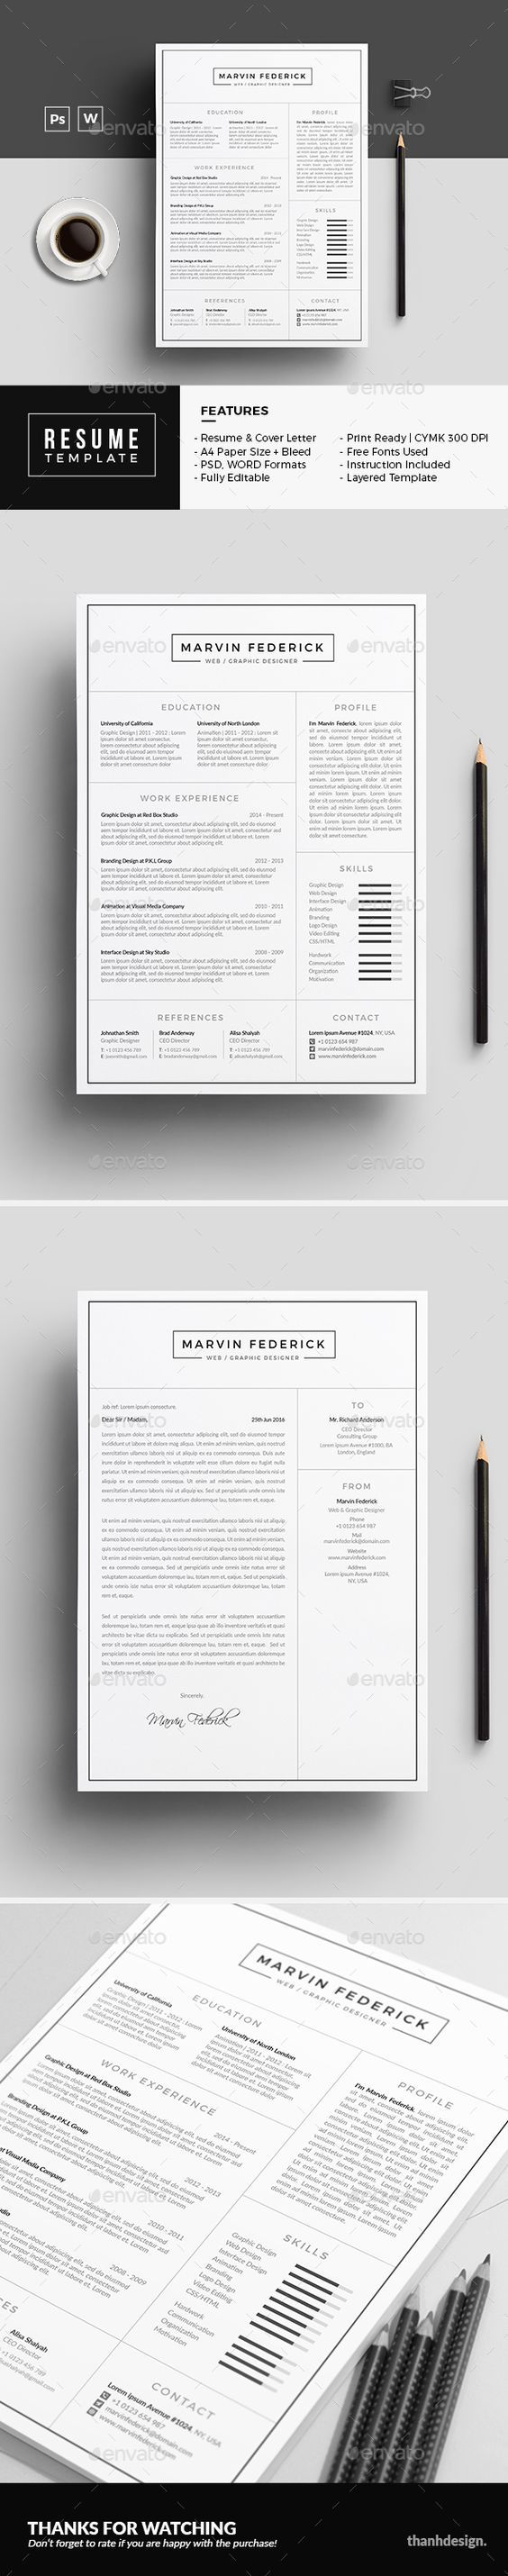 Resume / Curriculum Vitae / Design / Ideas / Inspiration / Clean / Minimalist / No Photo / Template